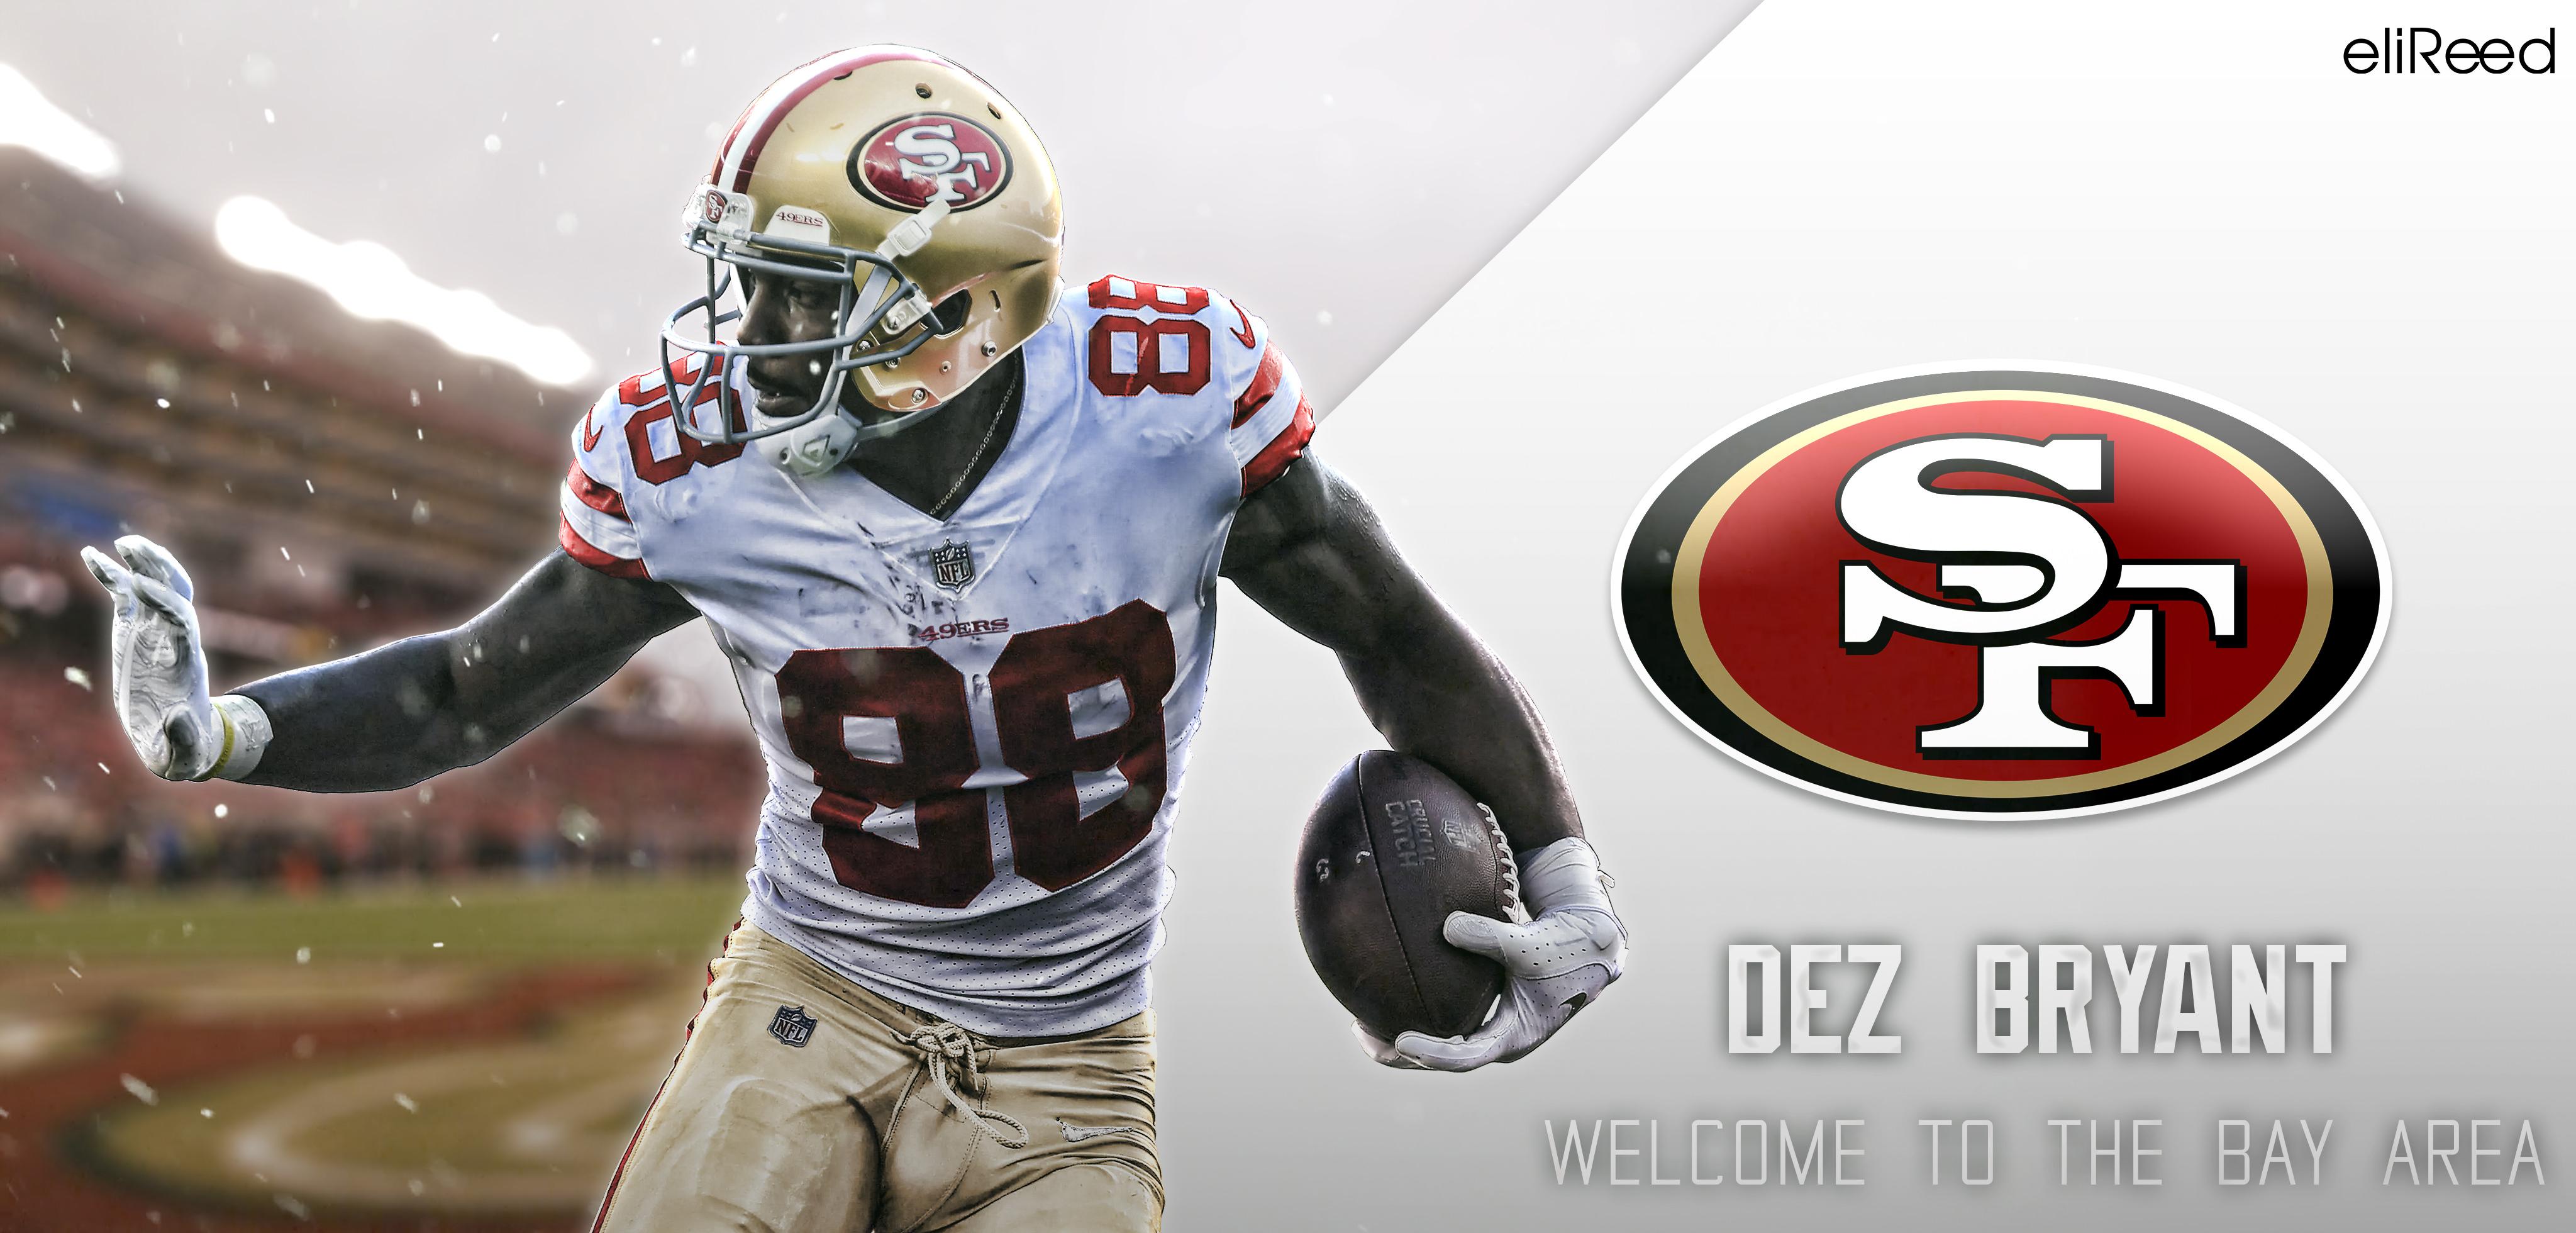 Dez Bryant 49ers Jersey - HD Wallpaper